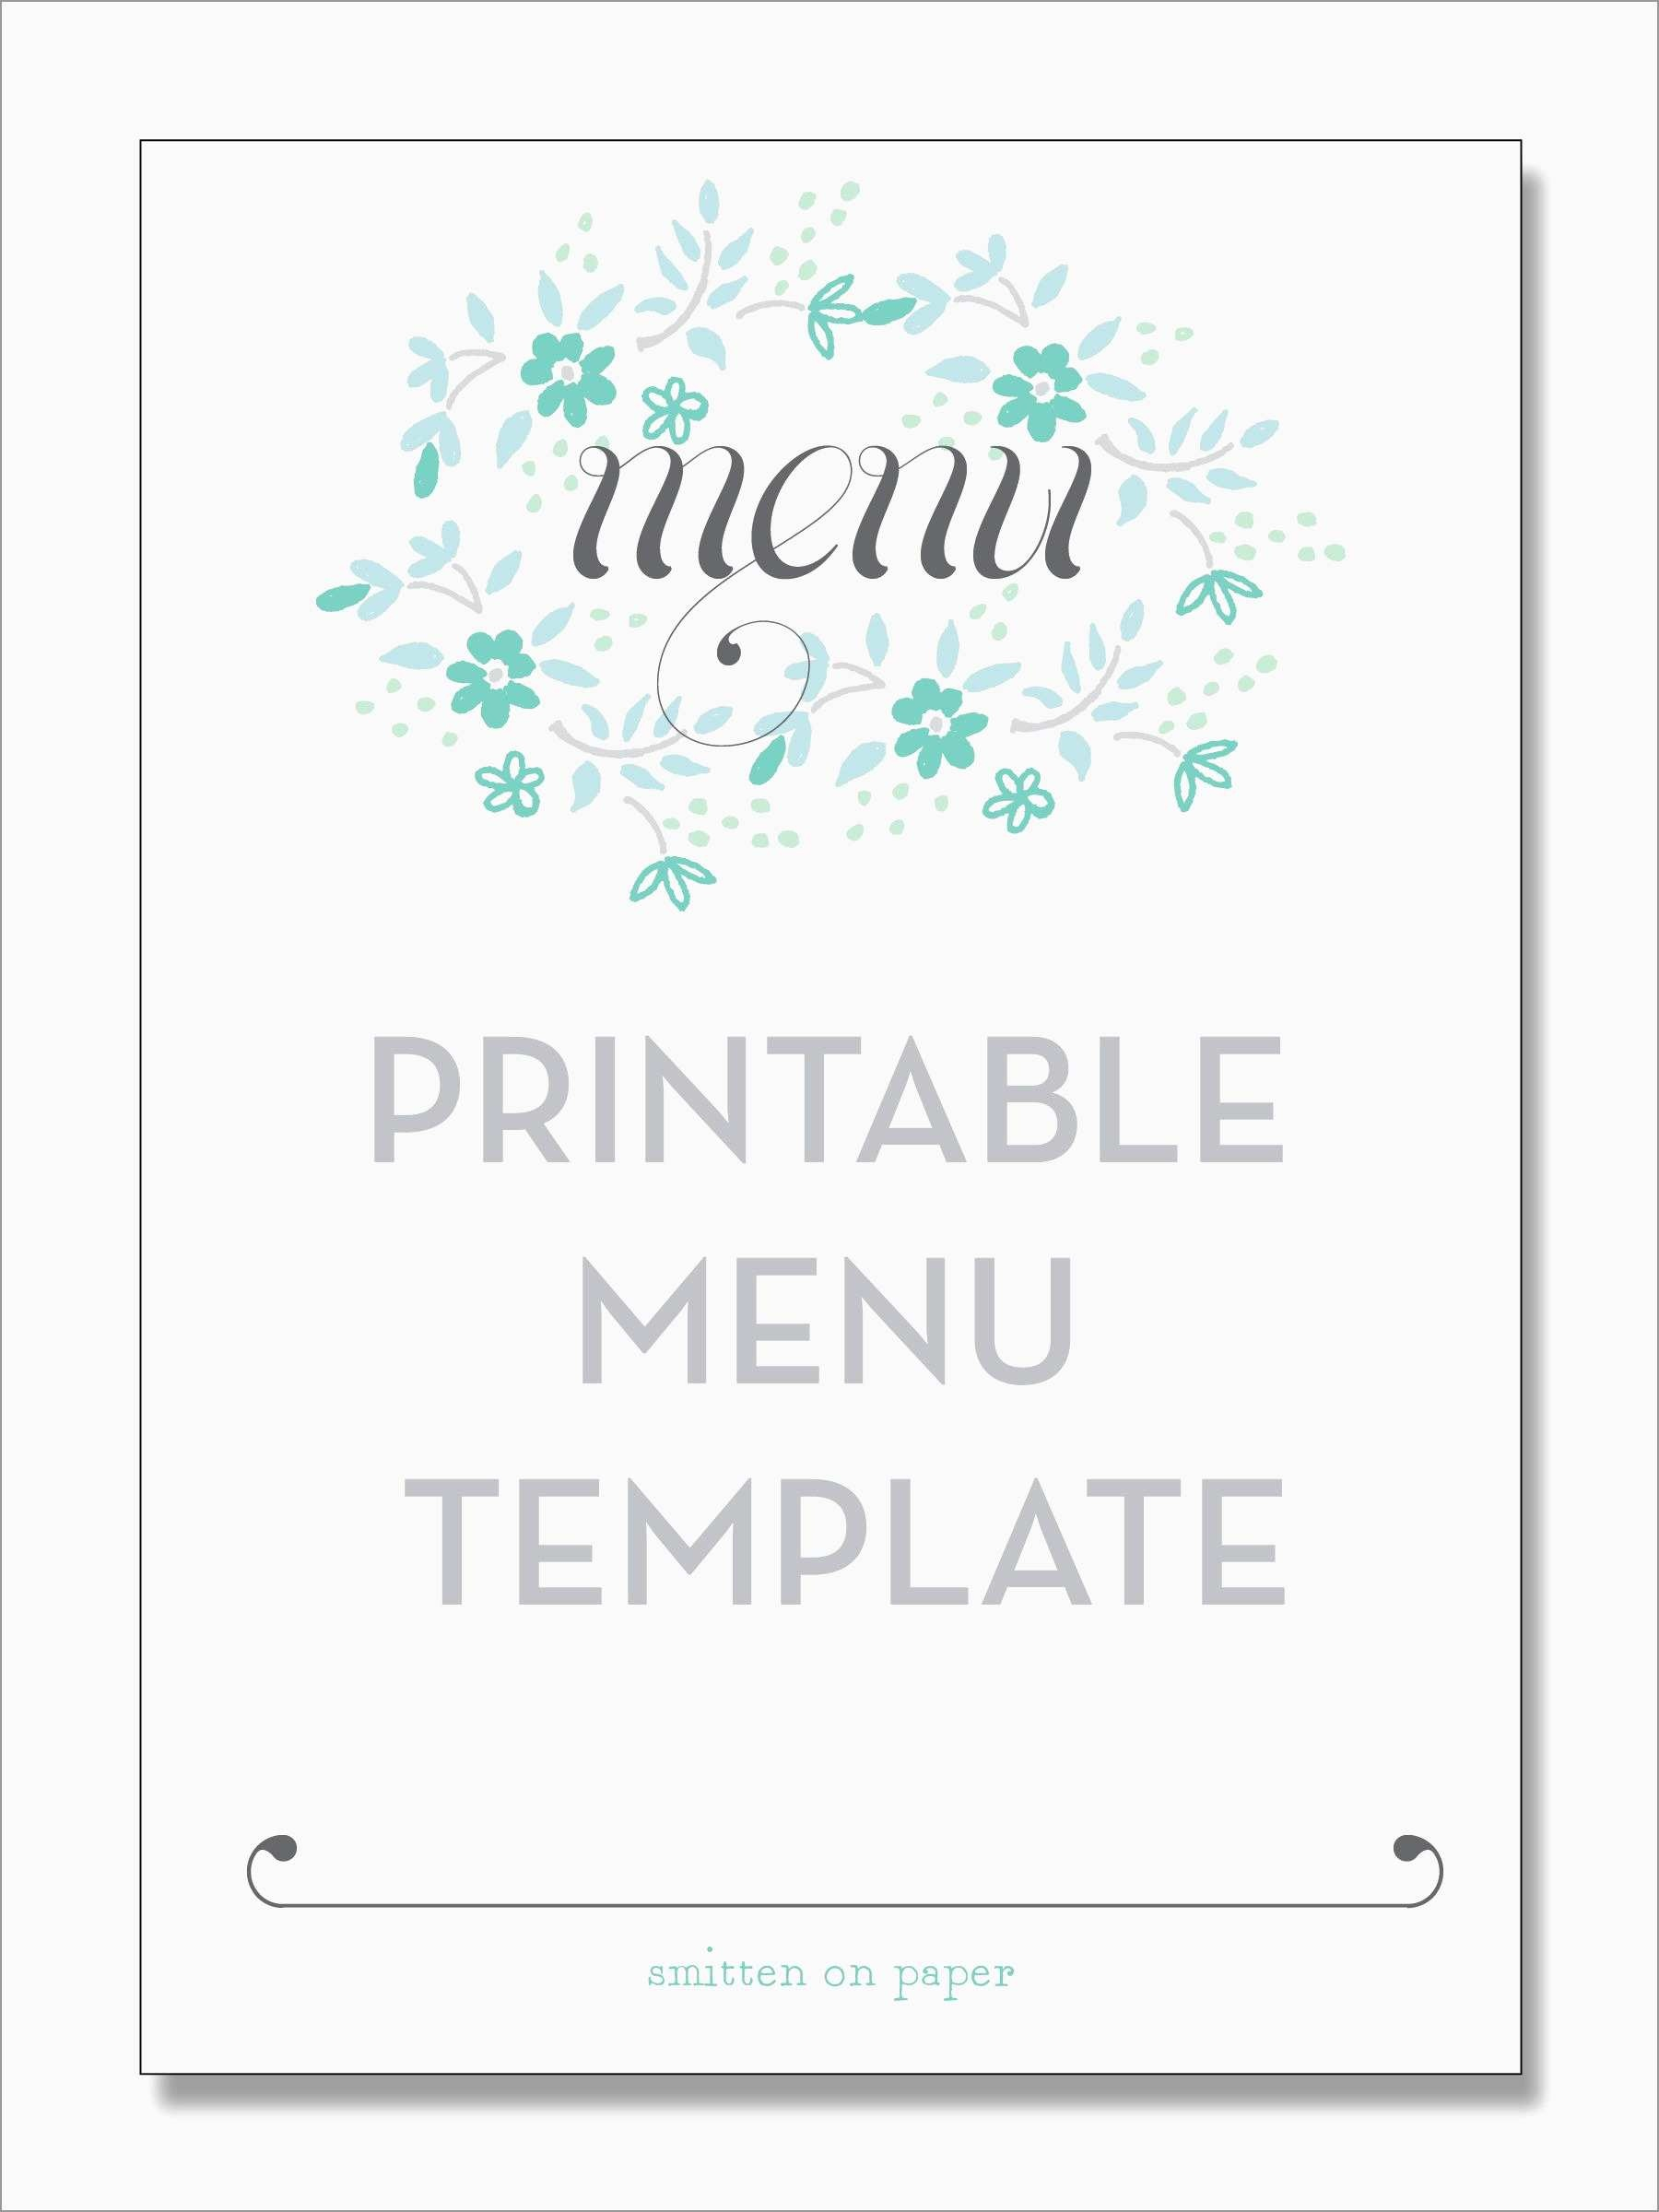 Free Menu Maker Template Pretty Restaurant Menu | Best Of Template - Free Printable Menu Maker